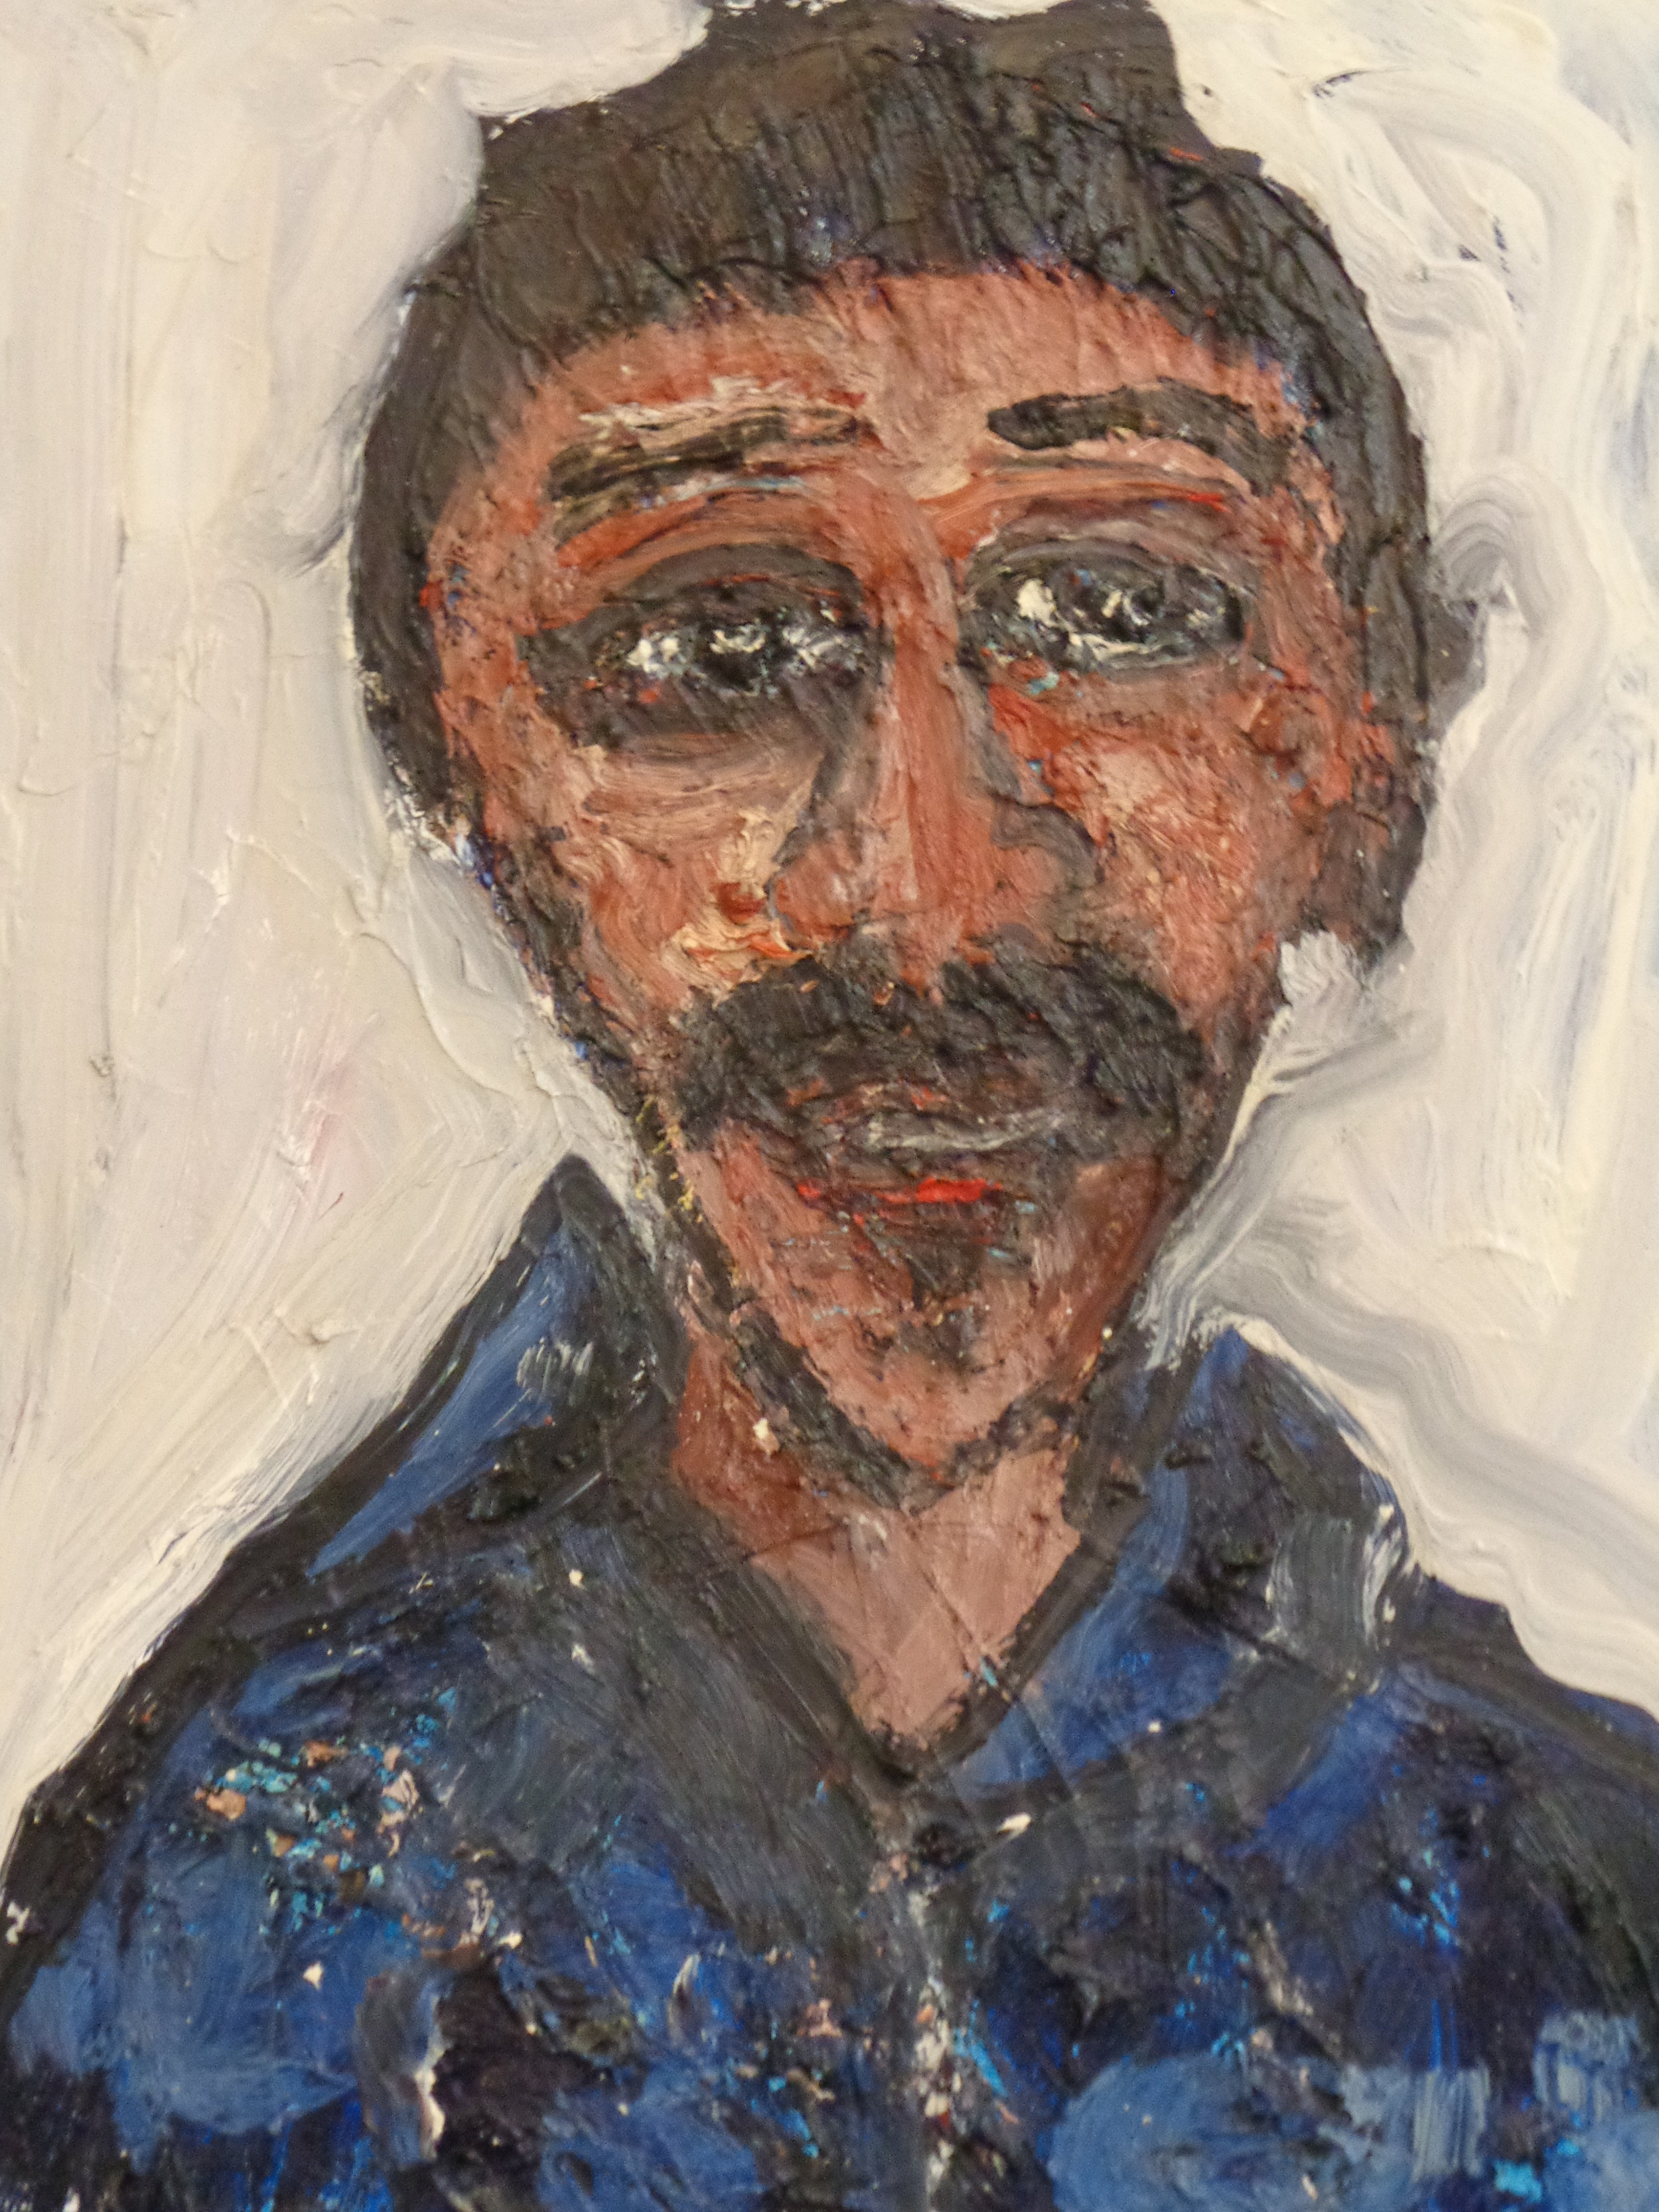 Artist, Patrick-Earl Barnes - oil on canvas 2017